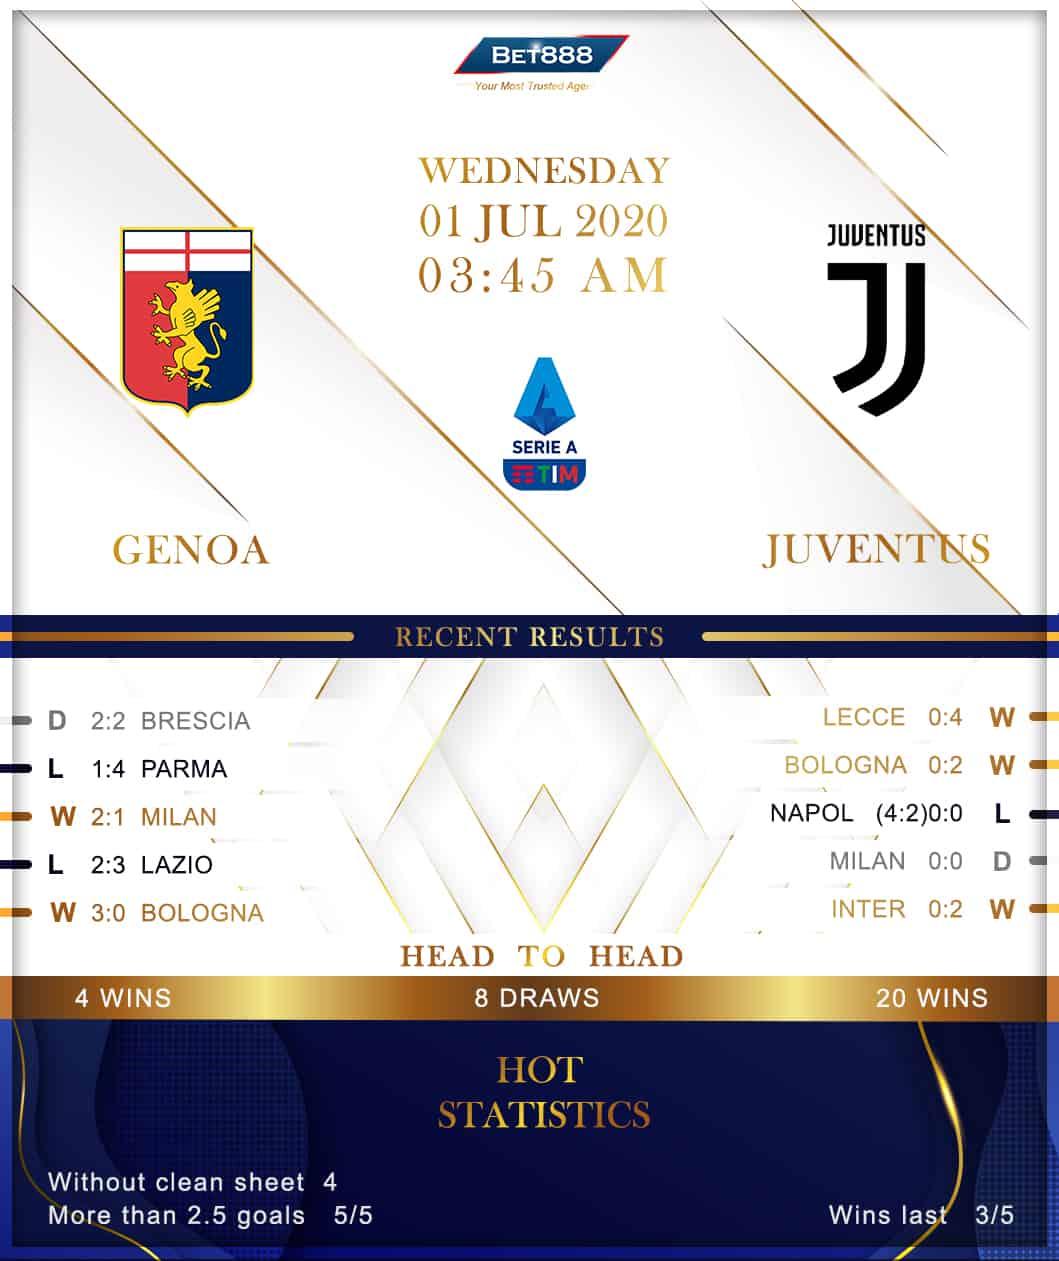 Genoa vs  Juventus 01/07/20